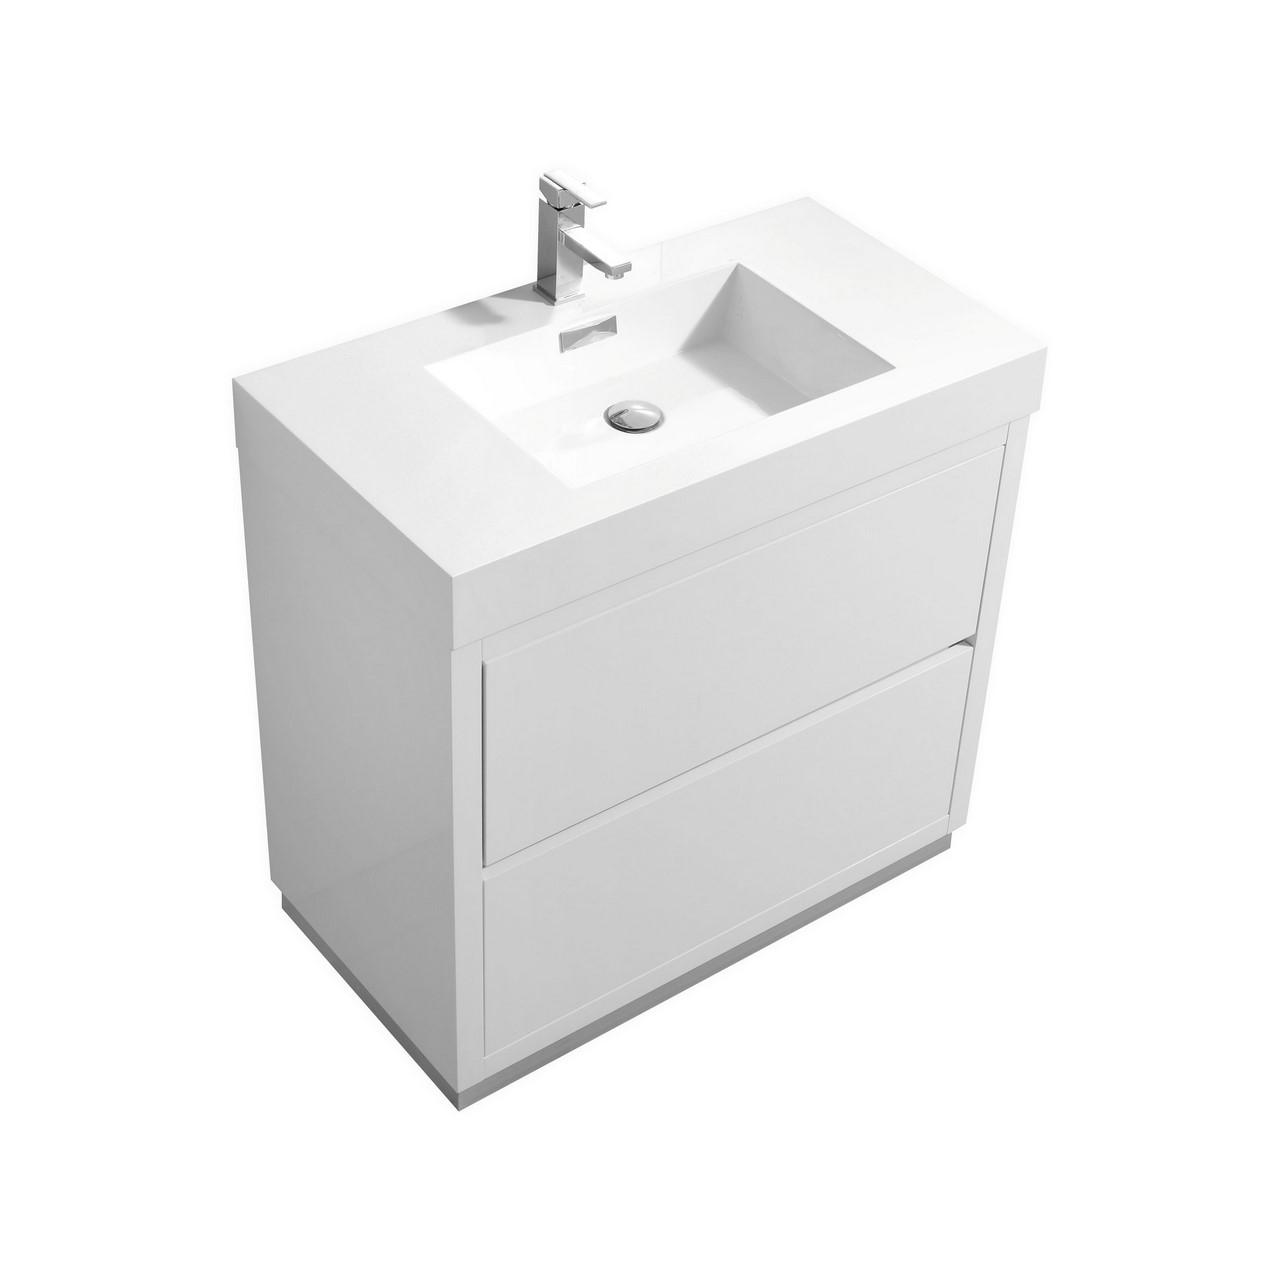 "Modern Lux 36"" High Gloss White Free Standing Modern Bathroom Vanity"